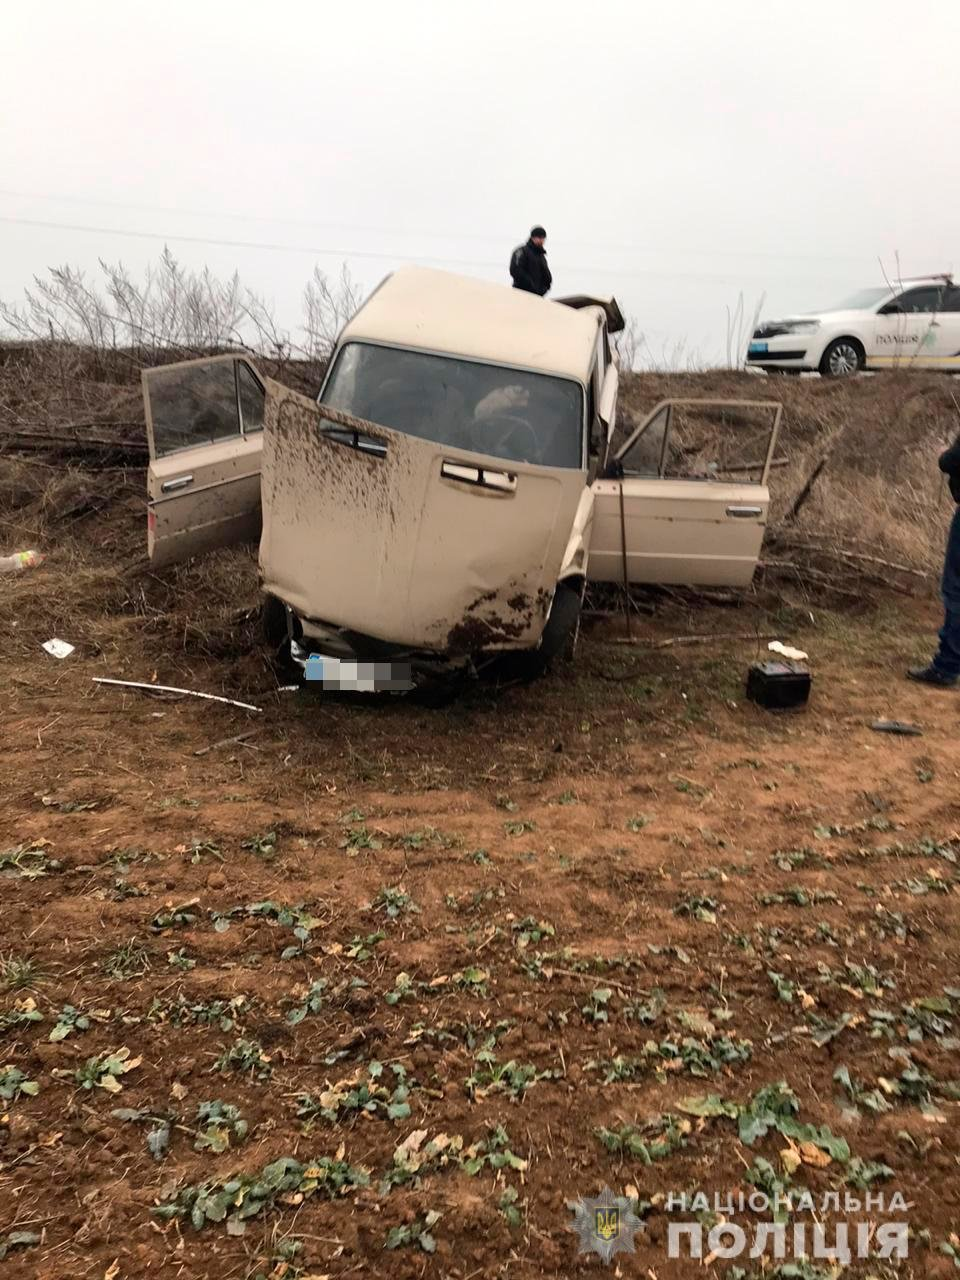 На Николаевщине за сутки в одном районе в авариях пострадало три человека, - ФОТО, фото-3